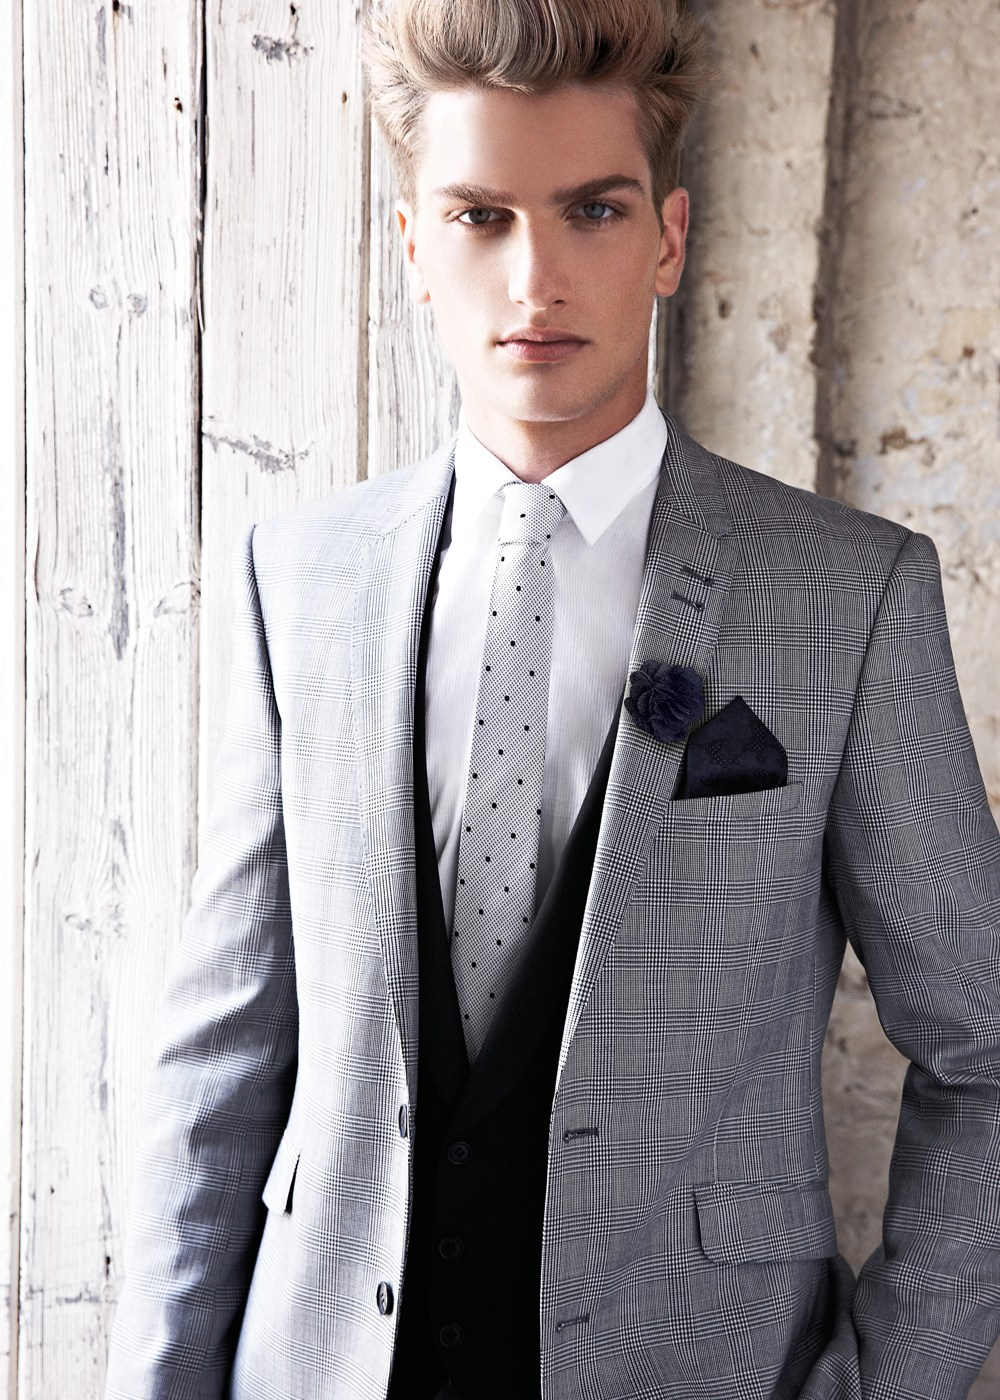 ea2d78f5cfad Мужской костюм в клетку (42 фото)  клетчатый серый костюм